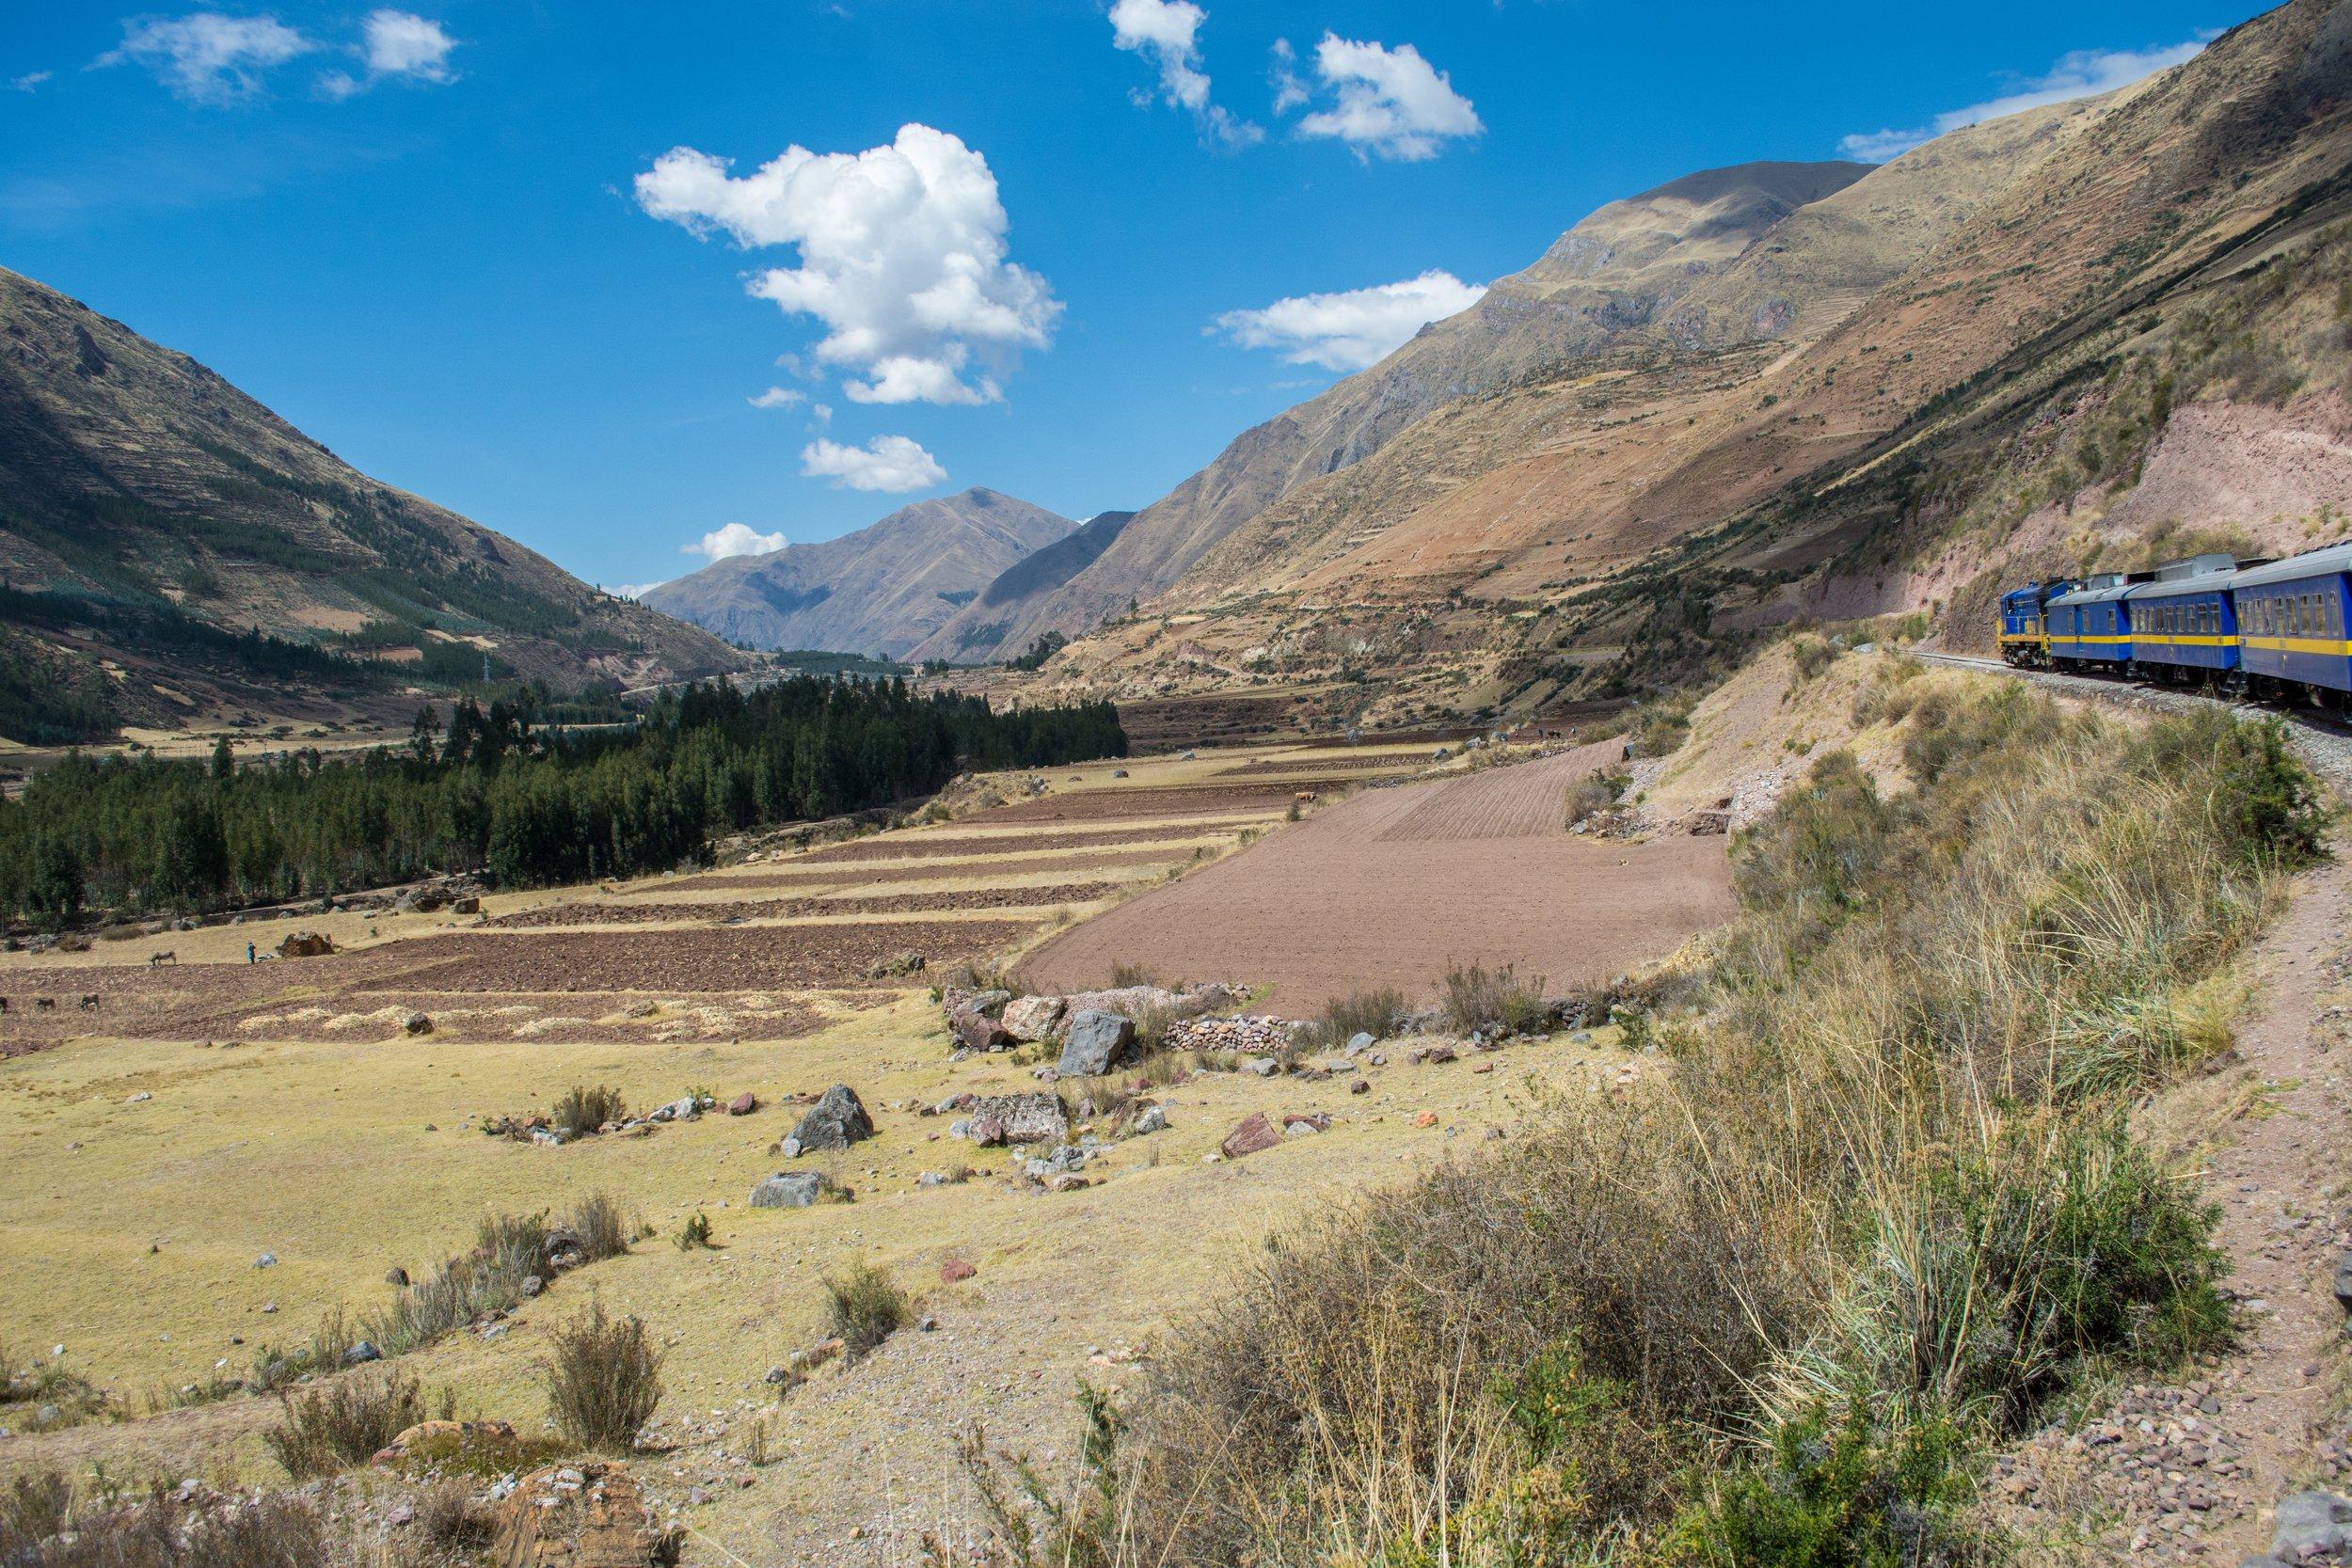 Luxury Perurail Lake Titicaca Train